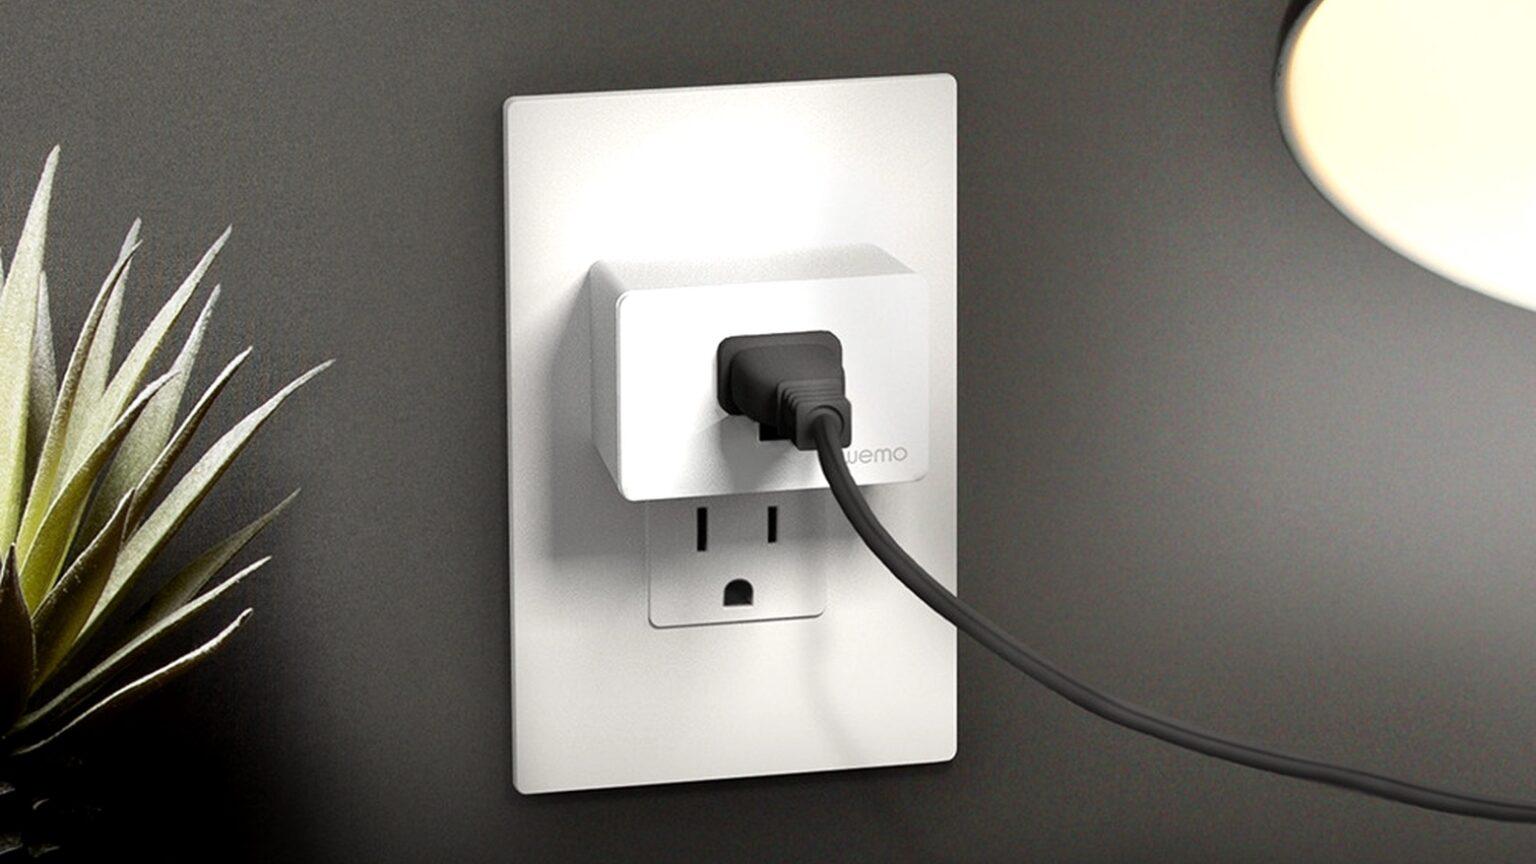 Wemo WiFi Smart Plug hardly takes up any room.